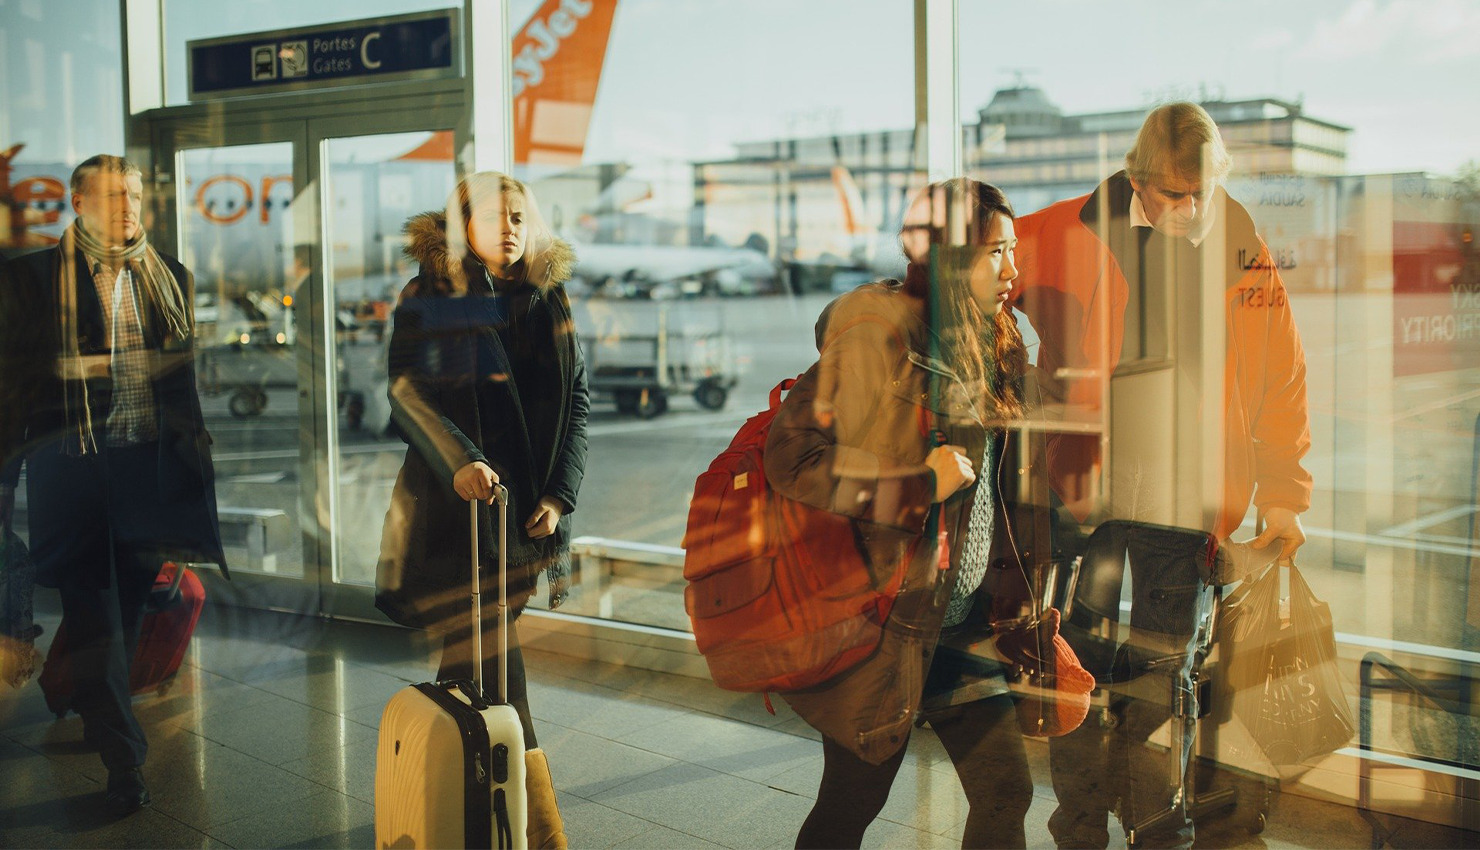 kiwi-viajar-magazinehorse